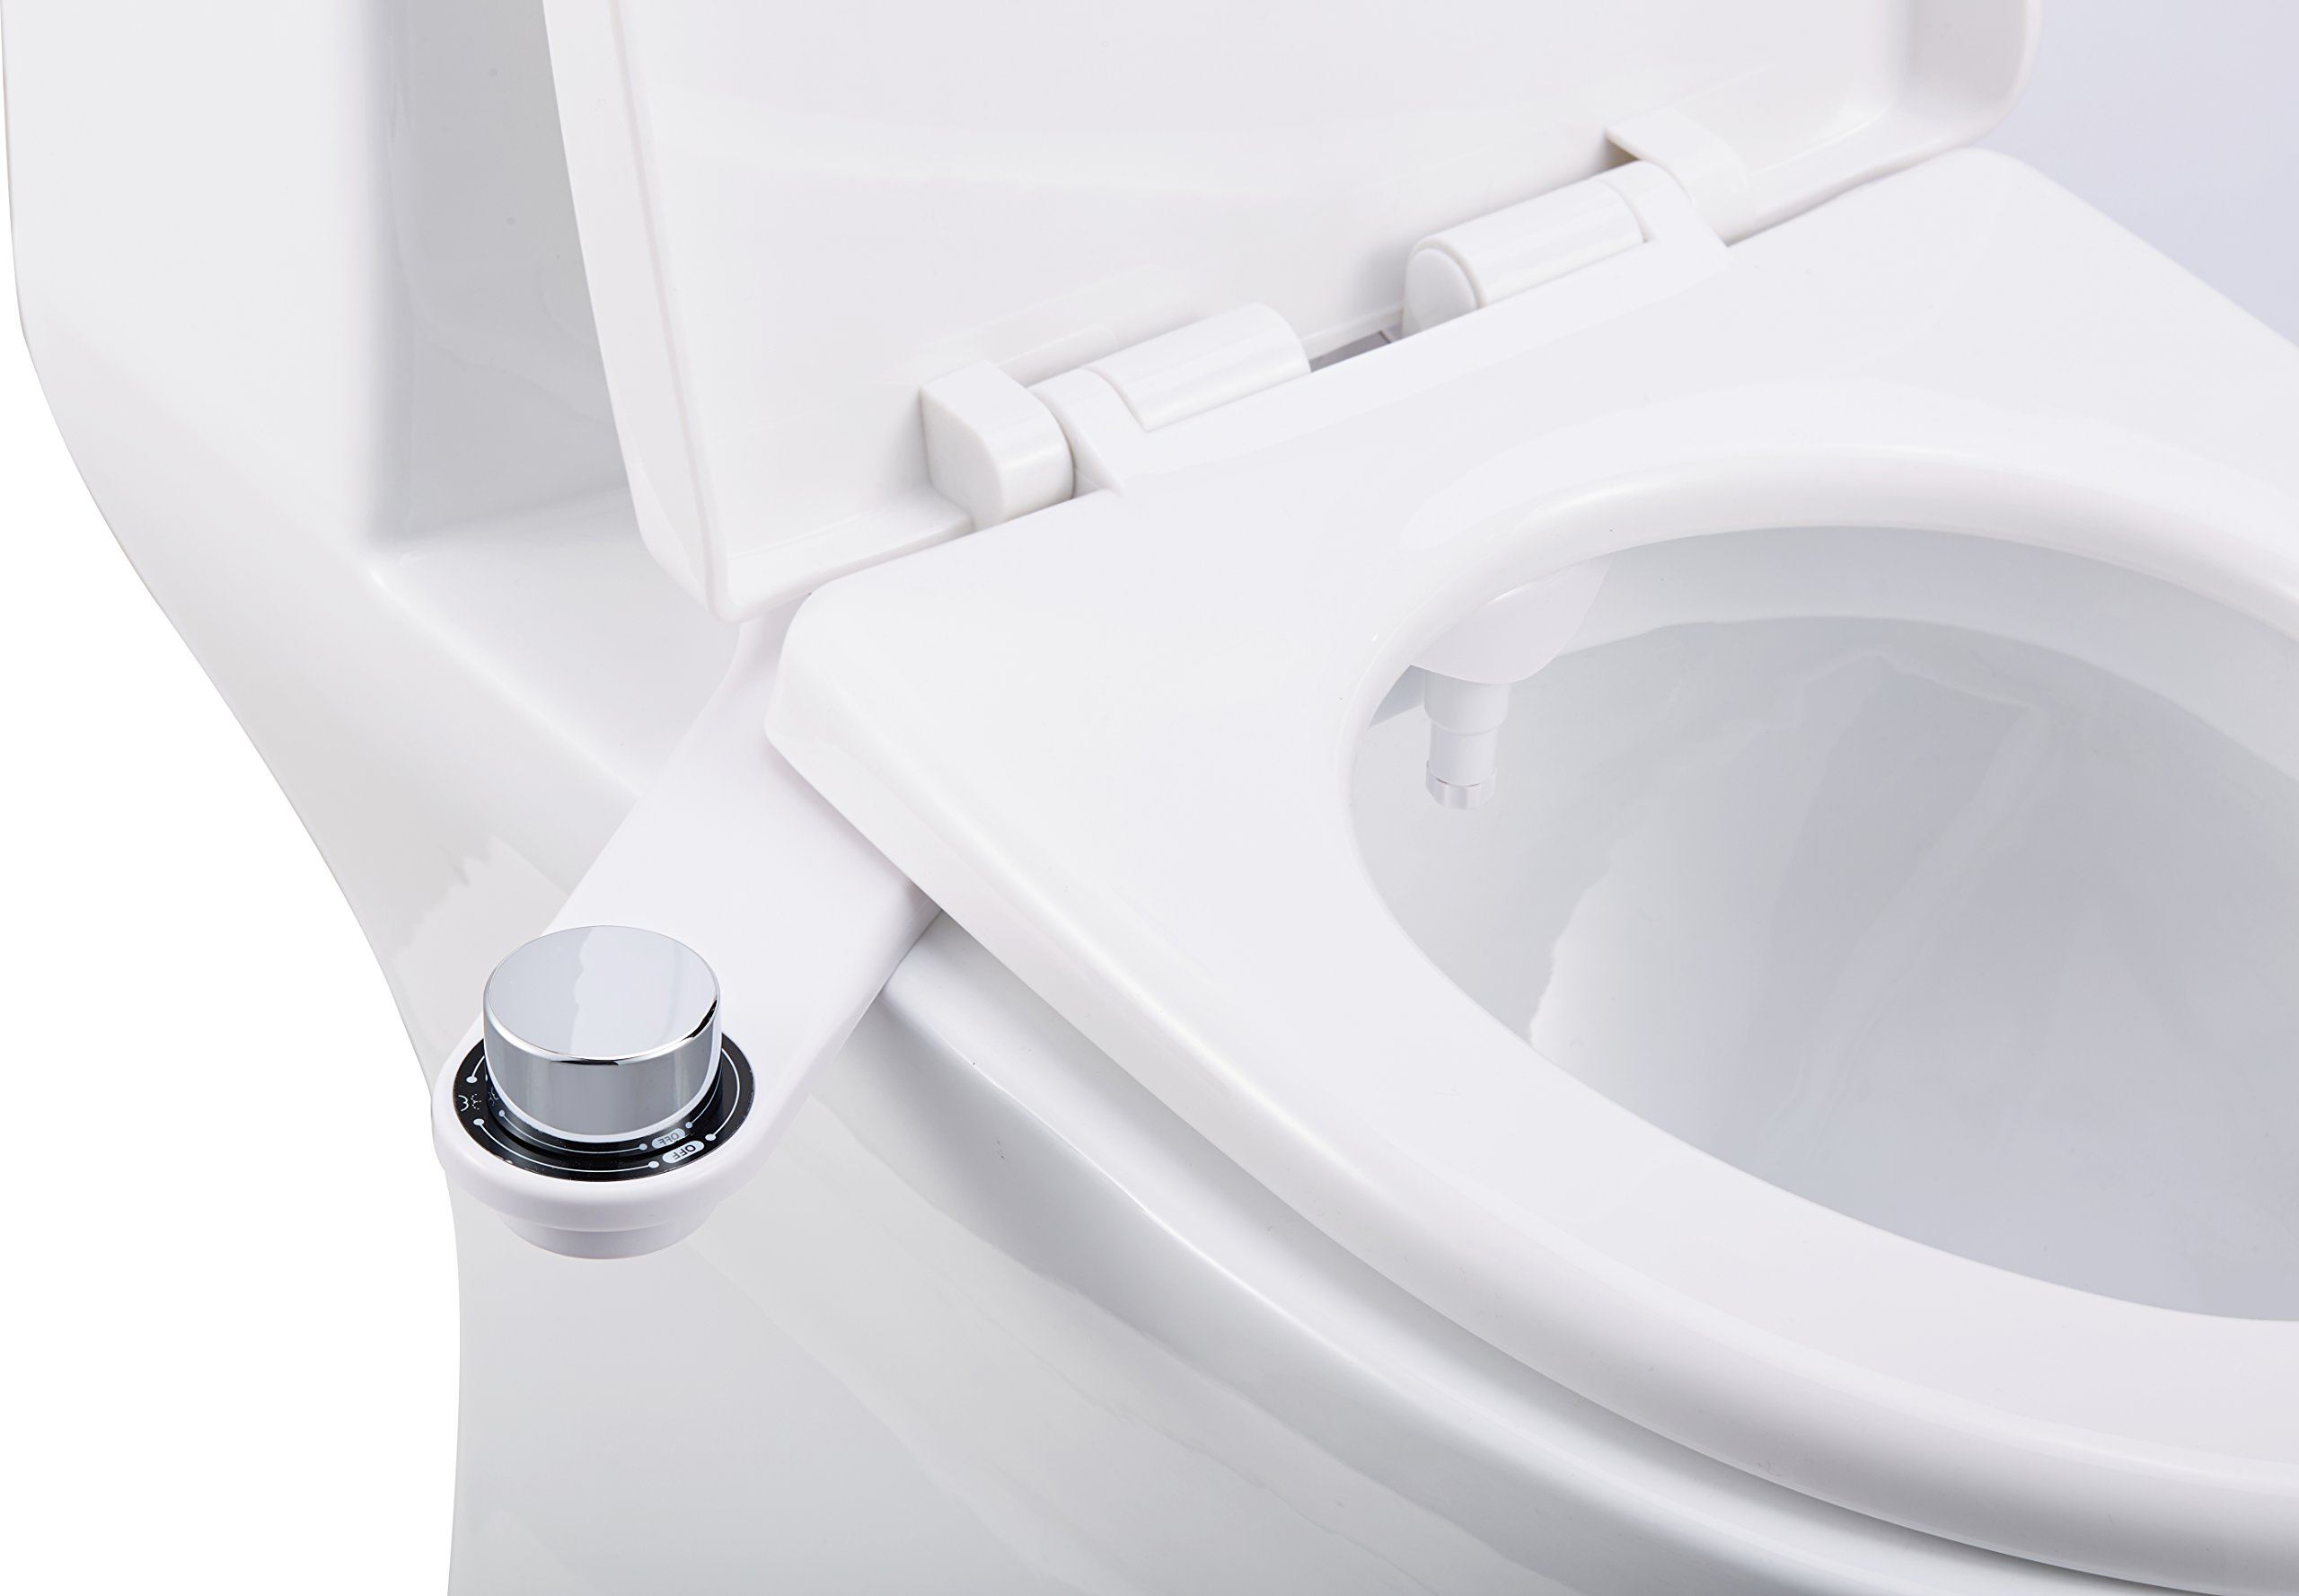 09cdba7c63f24 Details about Homlex Bidet Cold Water Spray Non-Electric Mechanical Bidets  Toilet Attachment